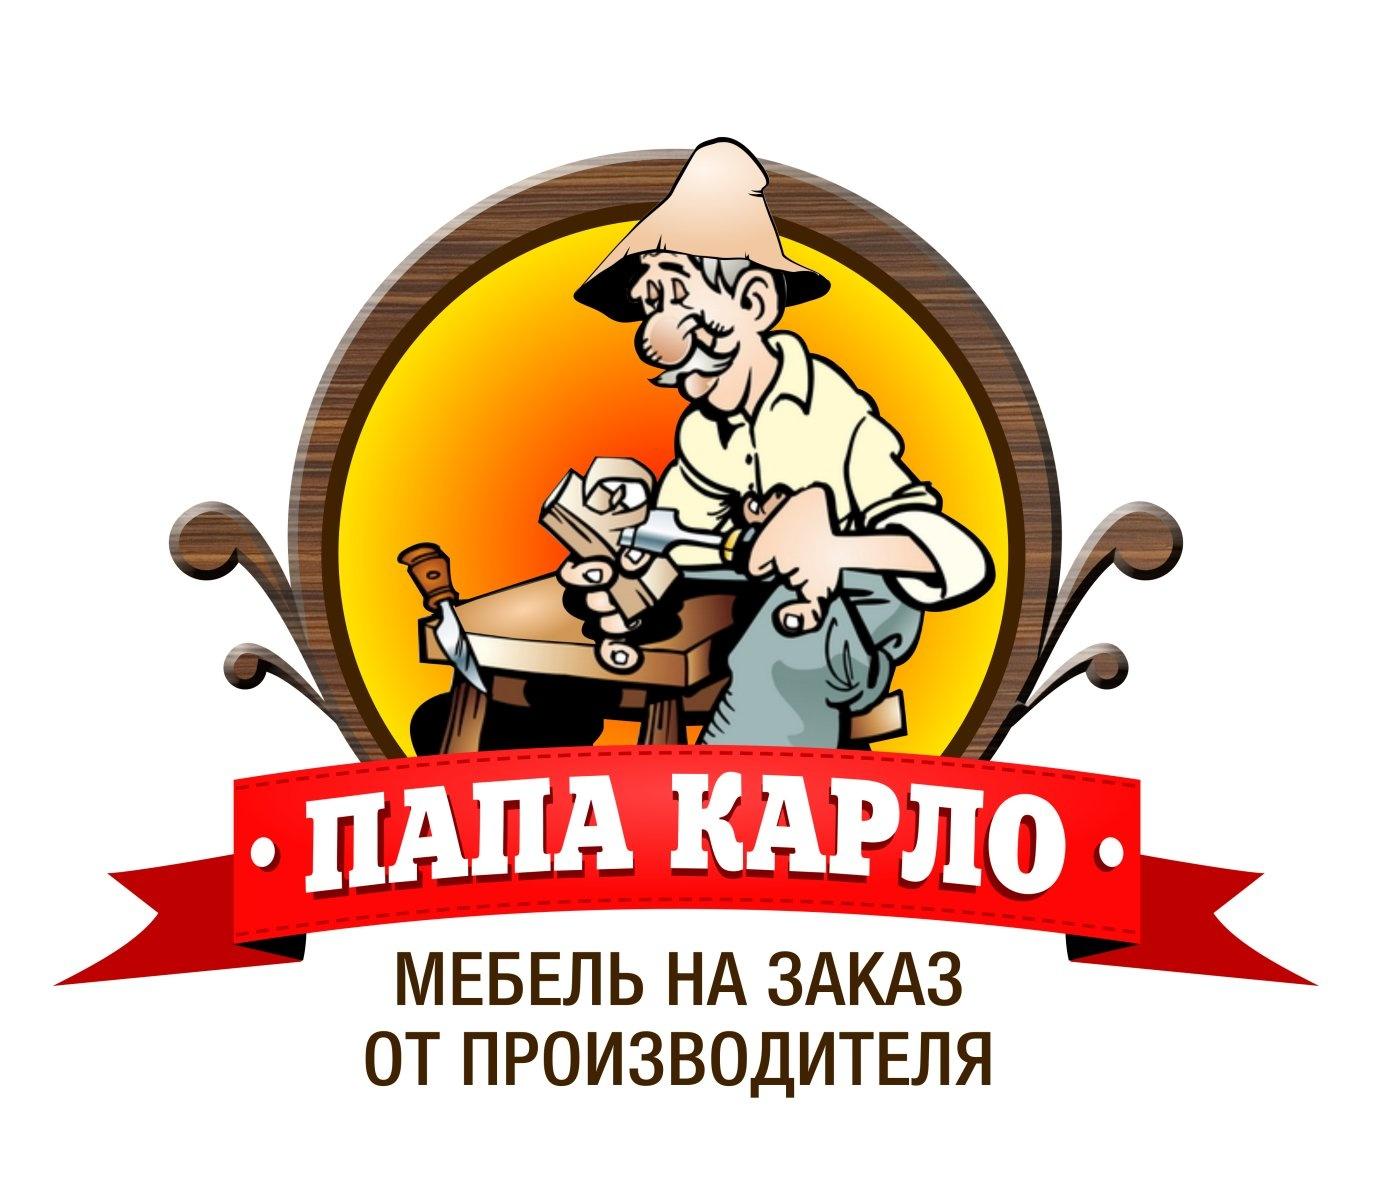 Зоомагазин Папа Карло Интернет Магазин